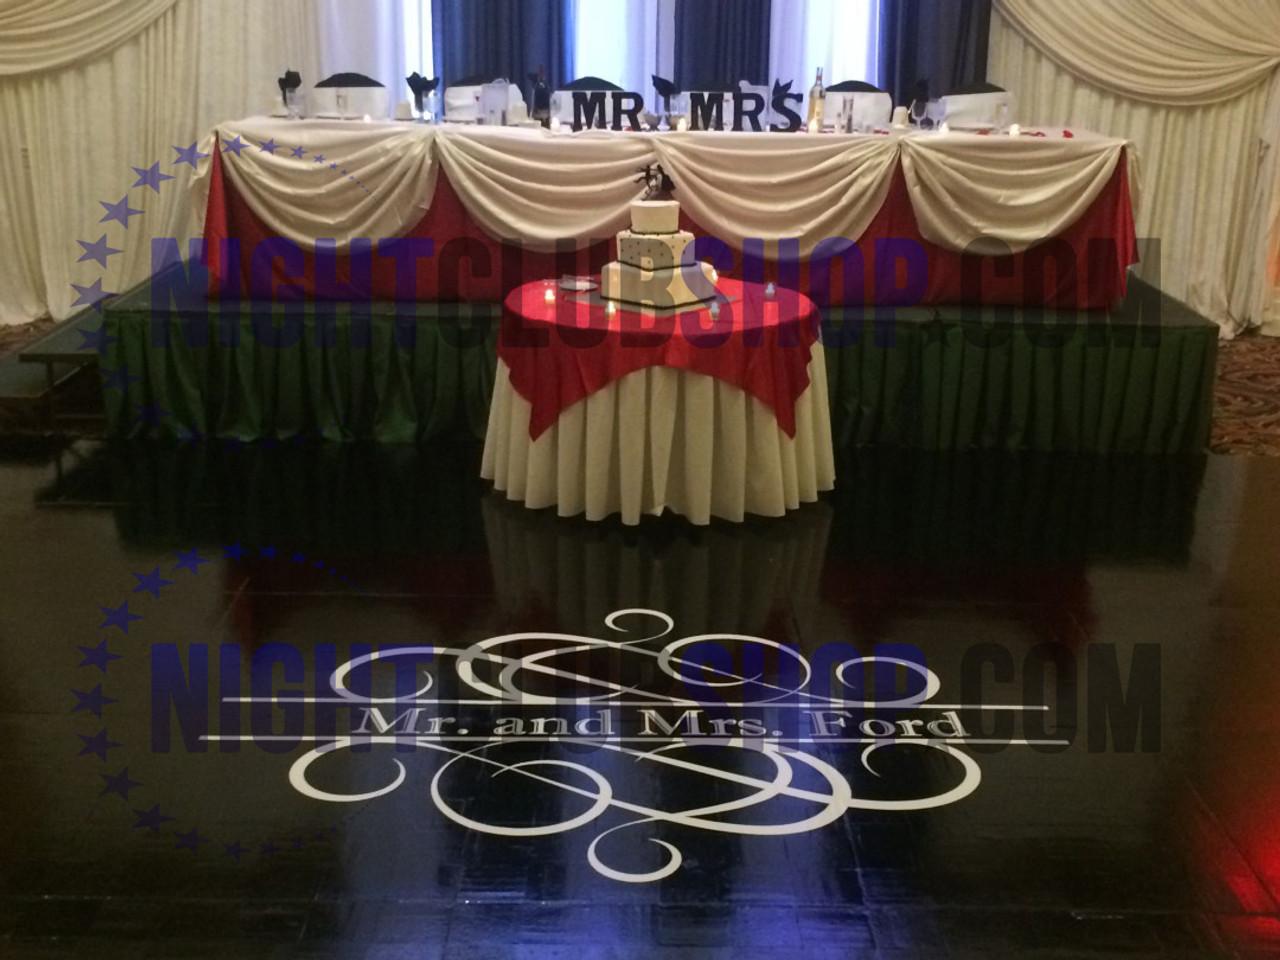 CUSTOM DANCE FLOOR VINYL DECAL DECOR WEDDING RECT